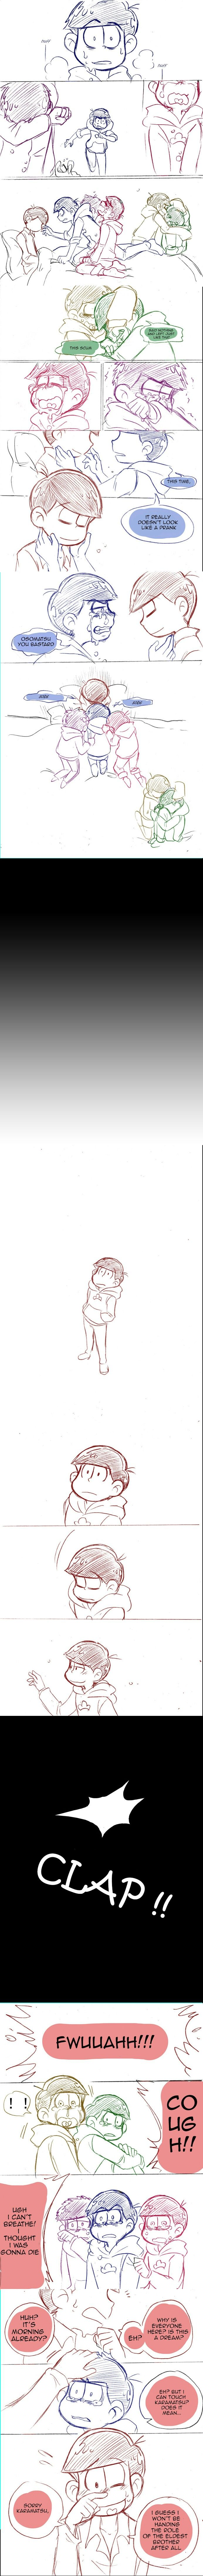 Part 6/8 *sit the corner room crying a lot * #Osomatsu AU